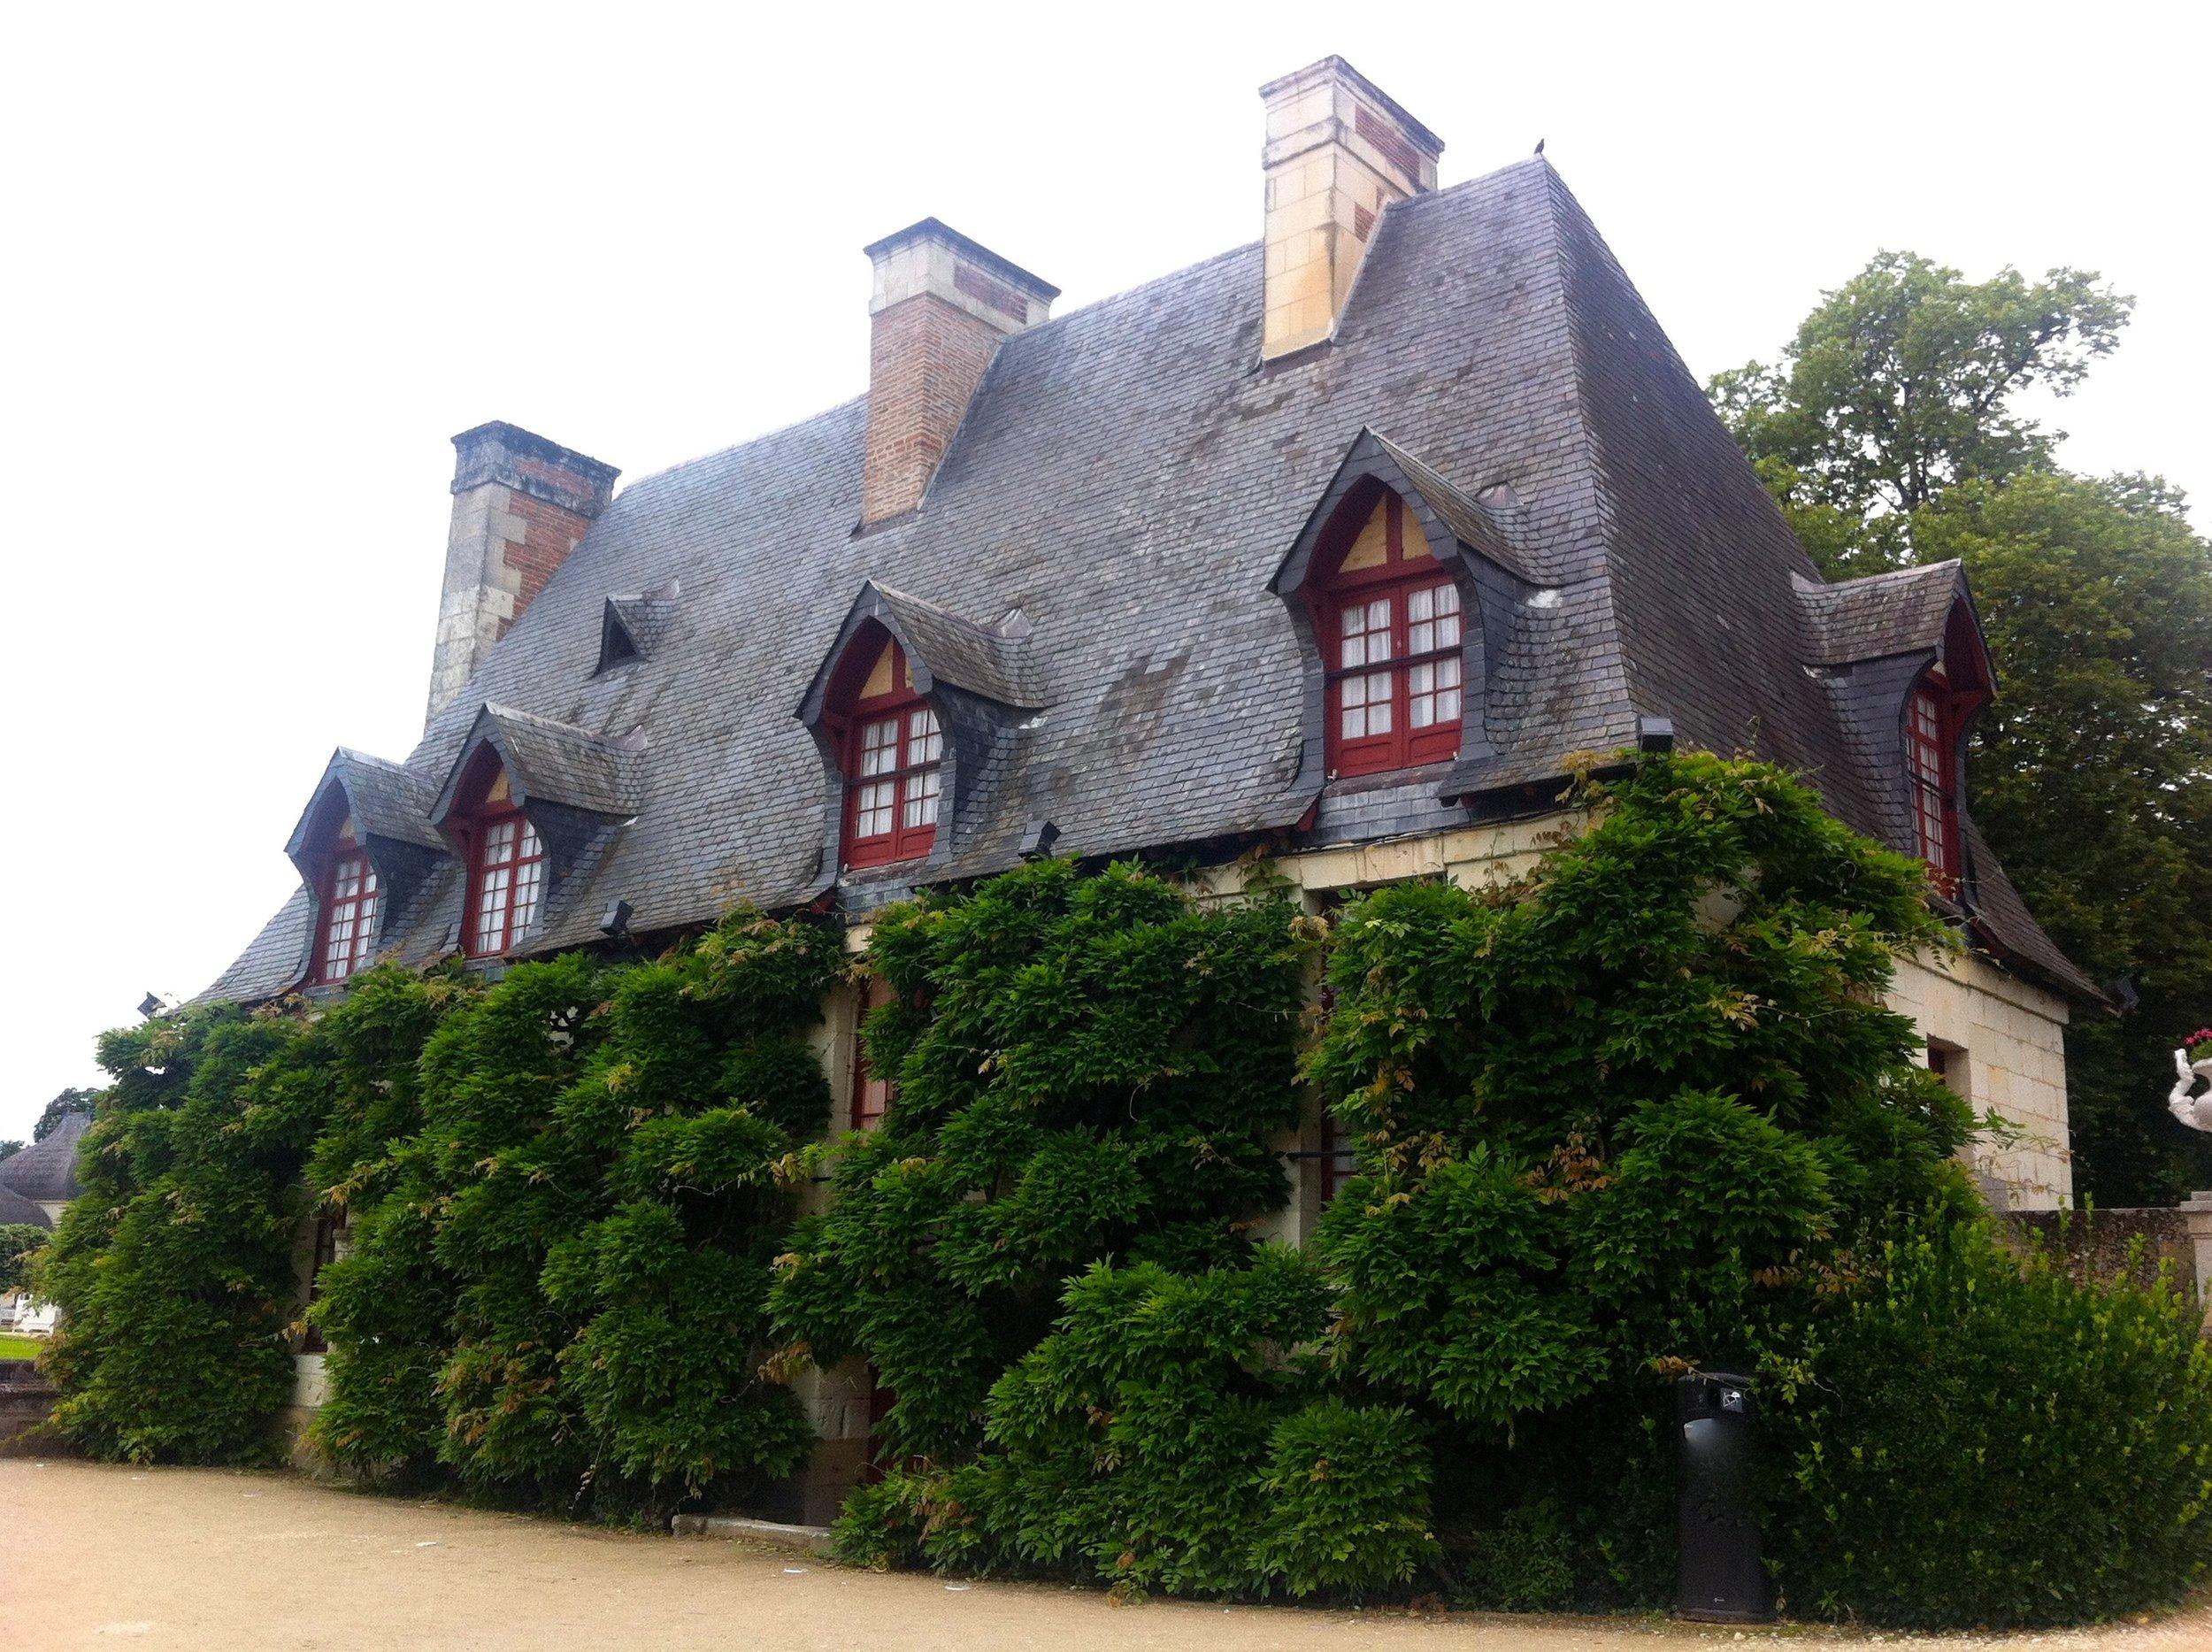 a mini chateau covered with greenery